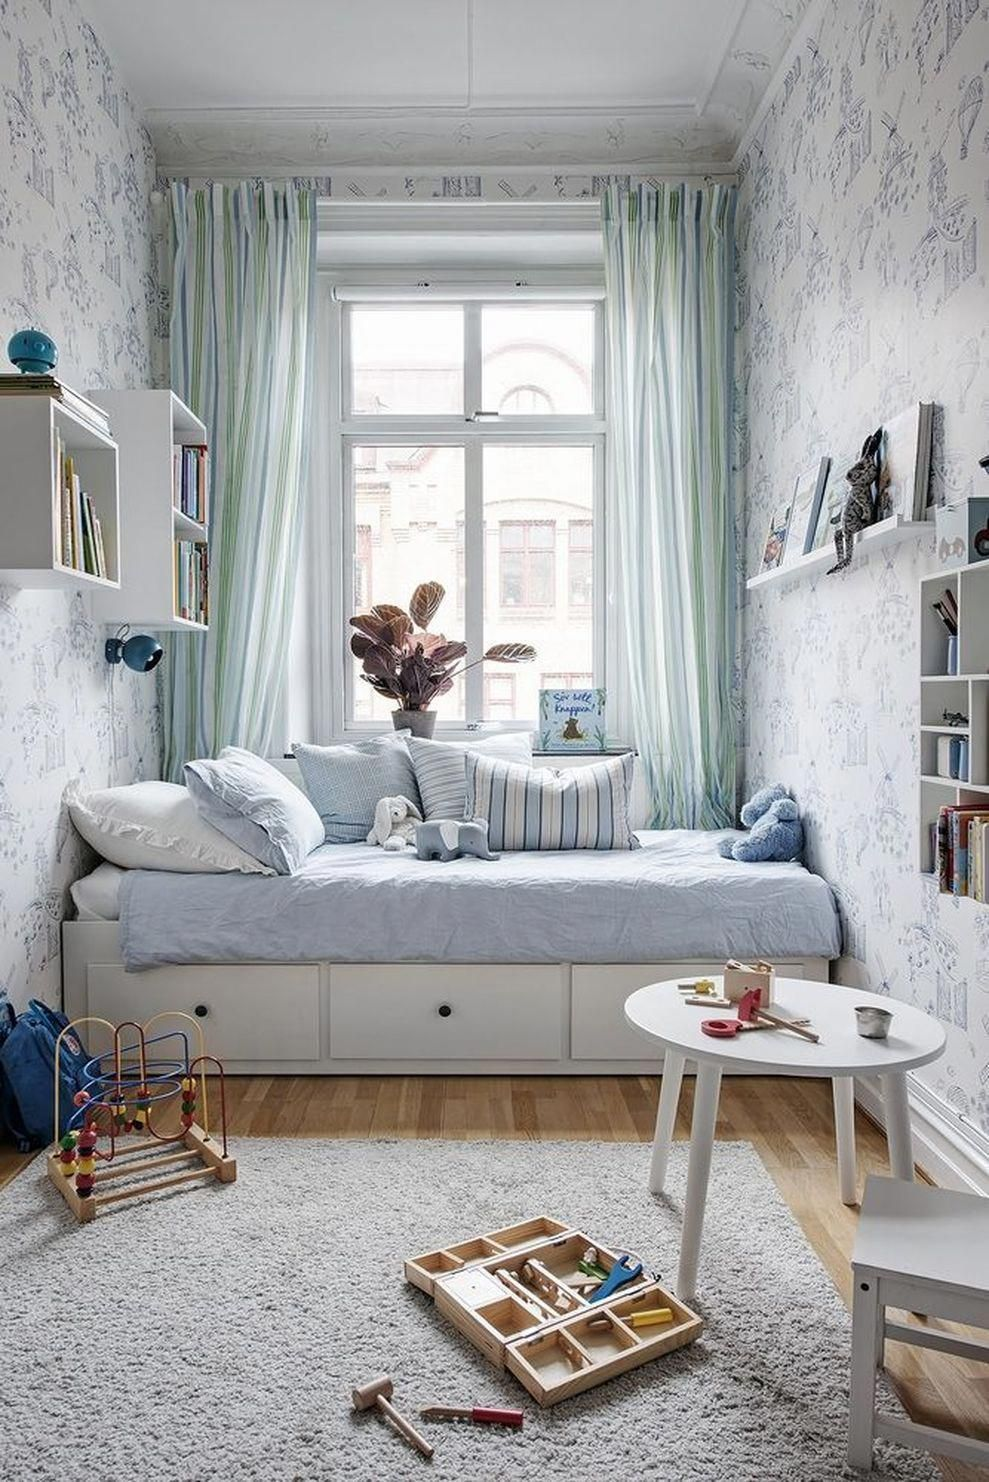 Small Room Design Ideas Philippines Smallroomdesign Apartment Bedroom Design Small Room Design Remodel Bedroom